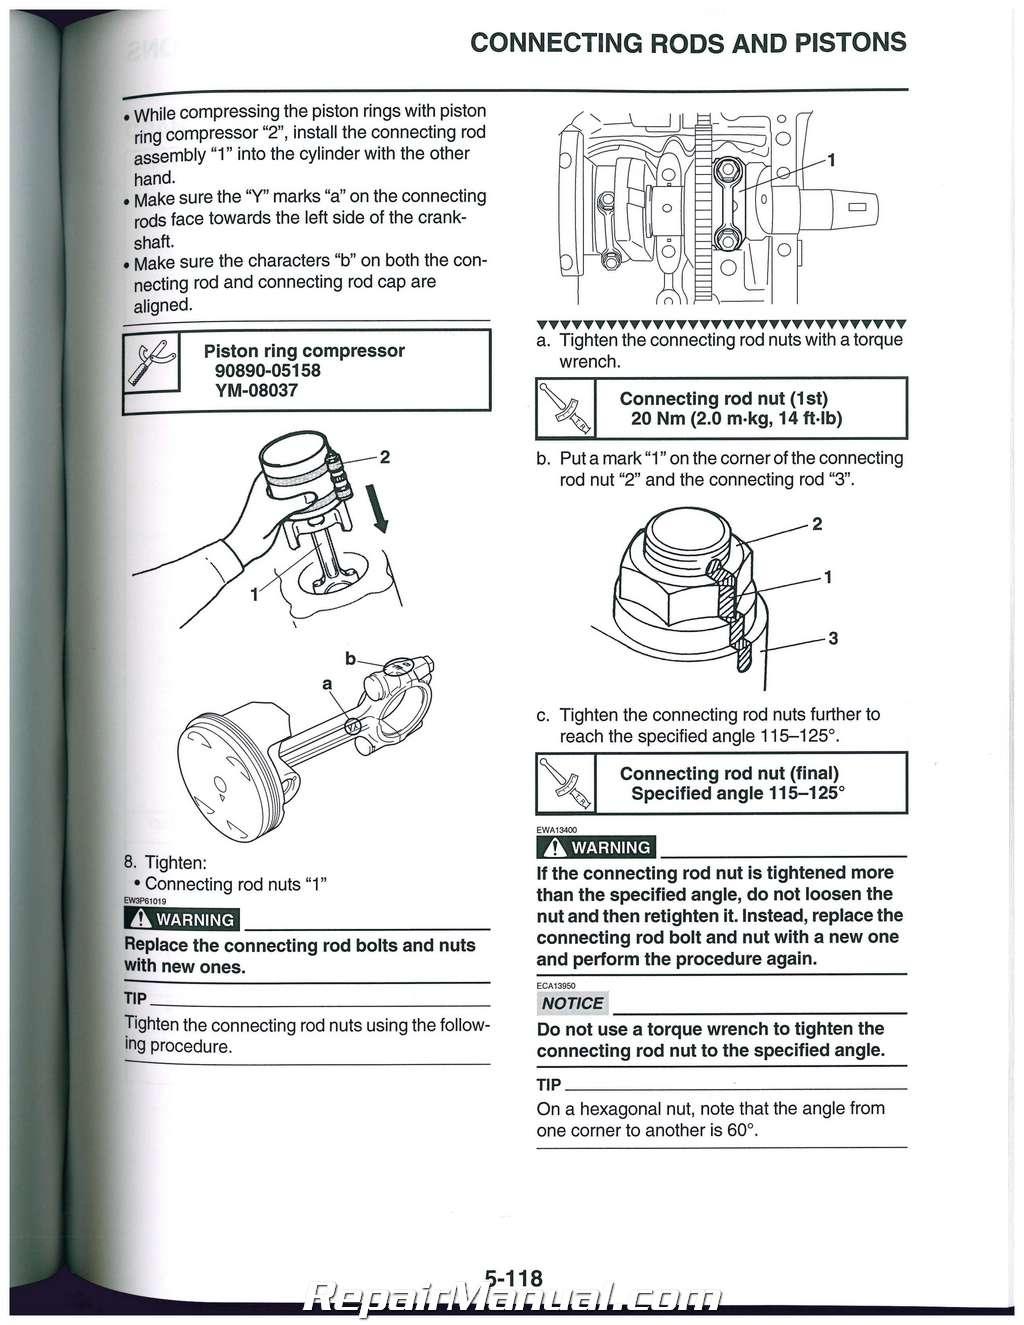 Yamaha fjr1300 service manual | ebay.